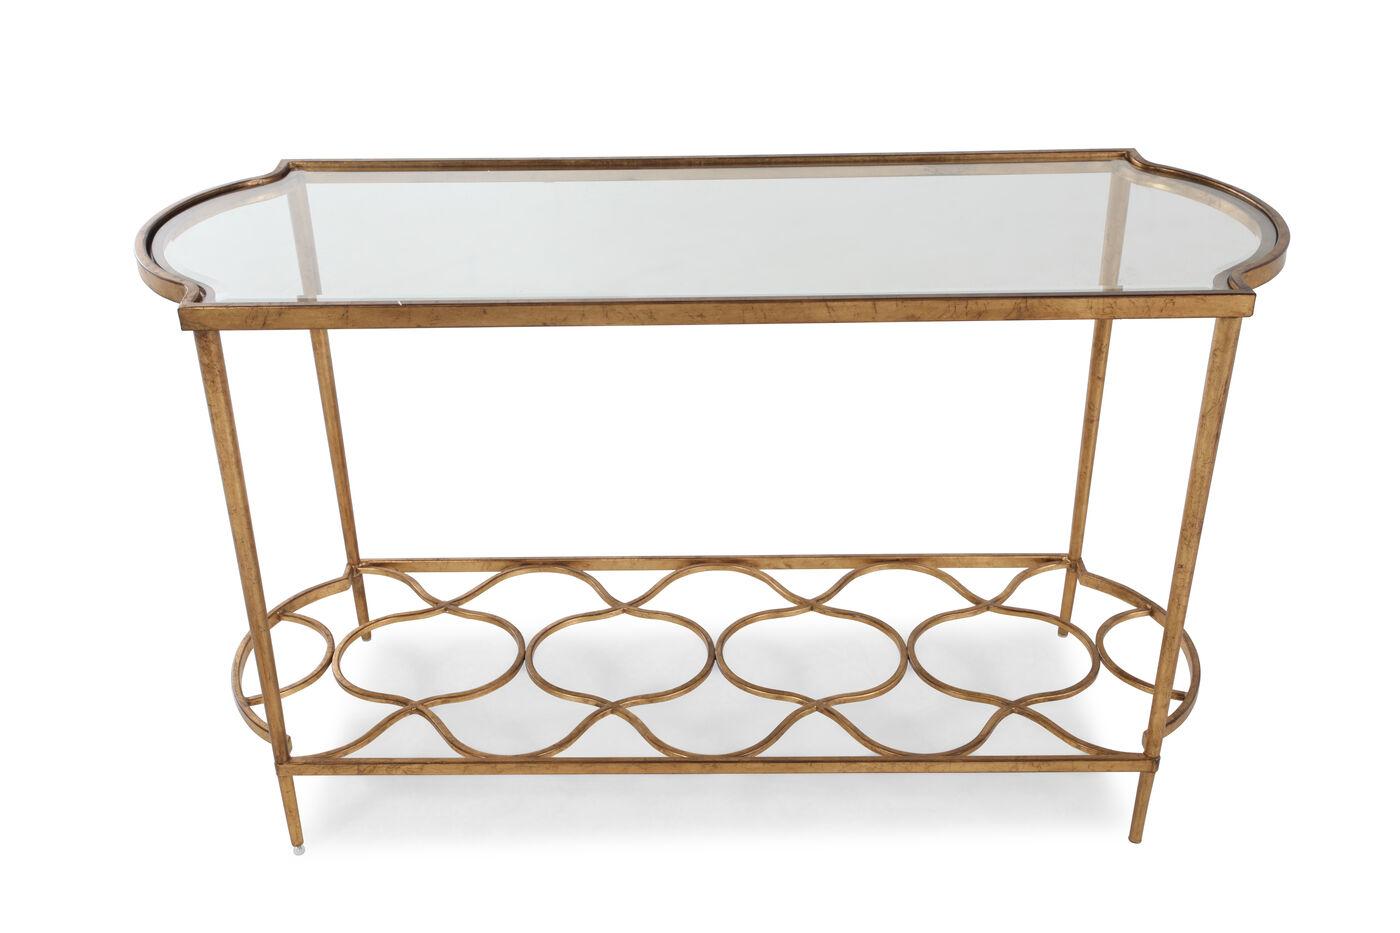 Quatrefoil Base Transitional Sofa Table In Aged Gold Mathis  ~ Transitional Sofa Tables